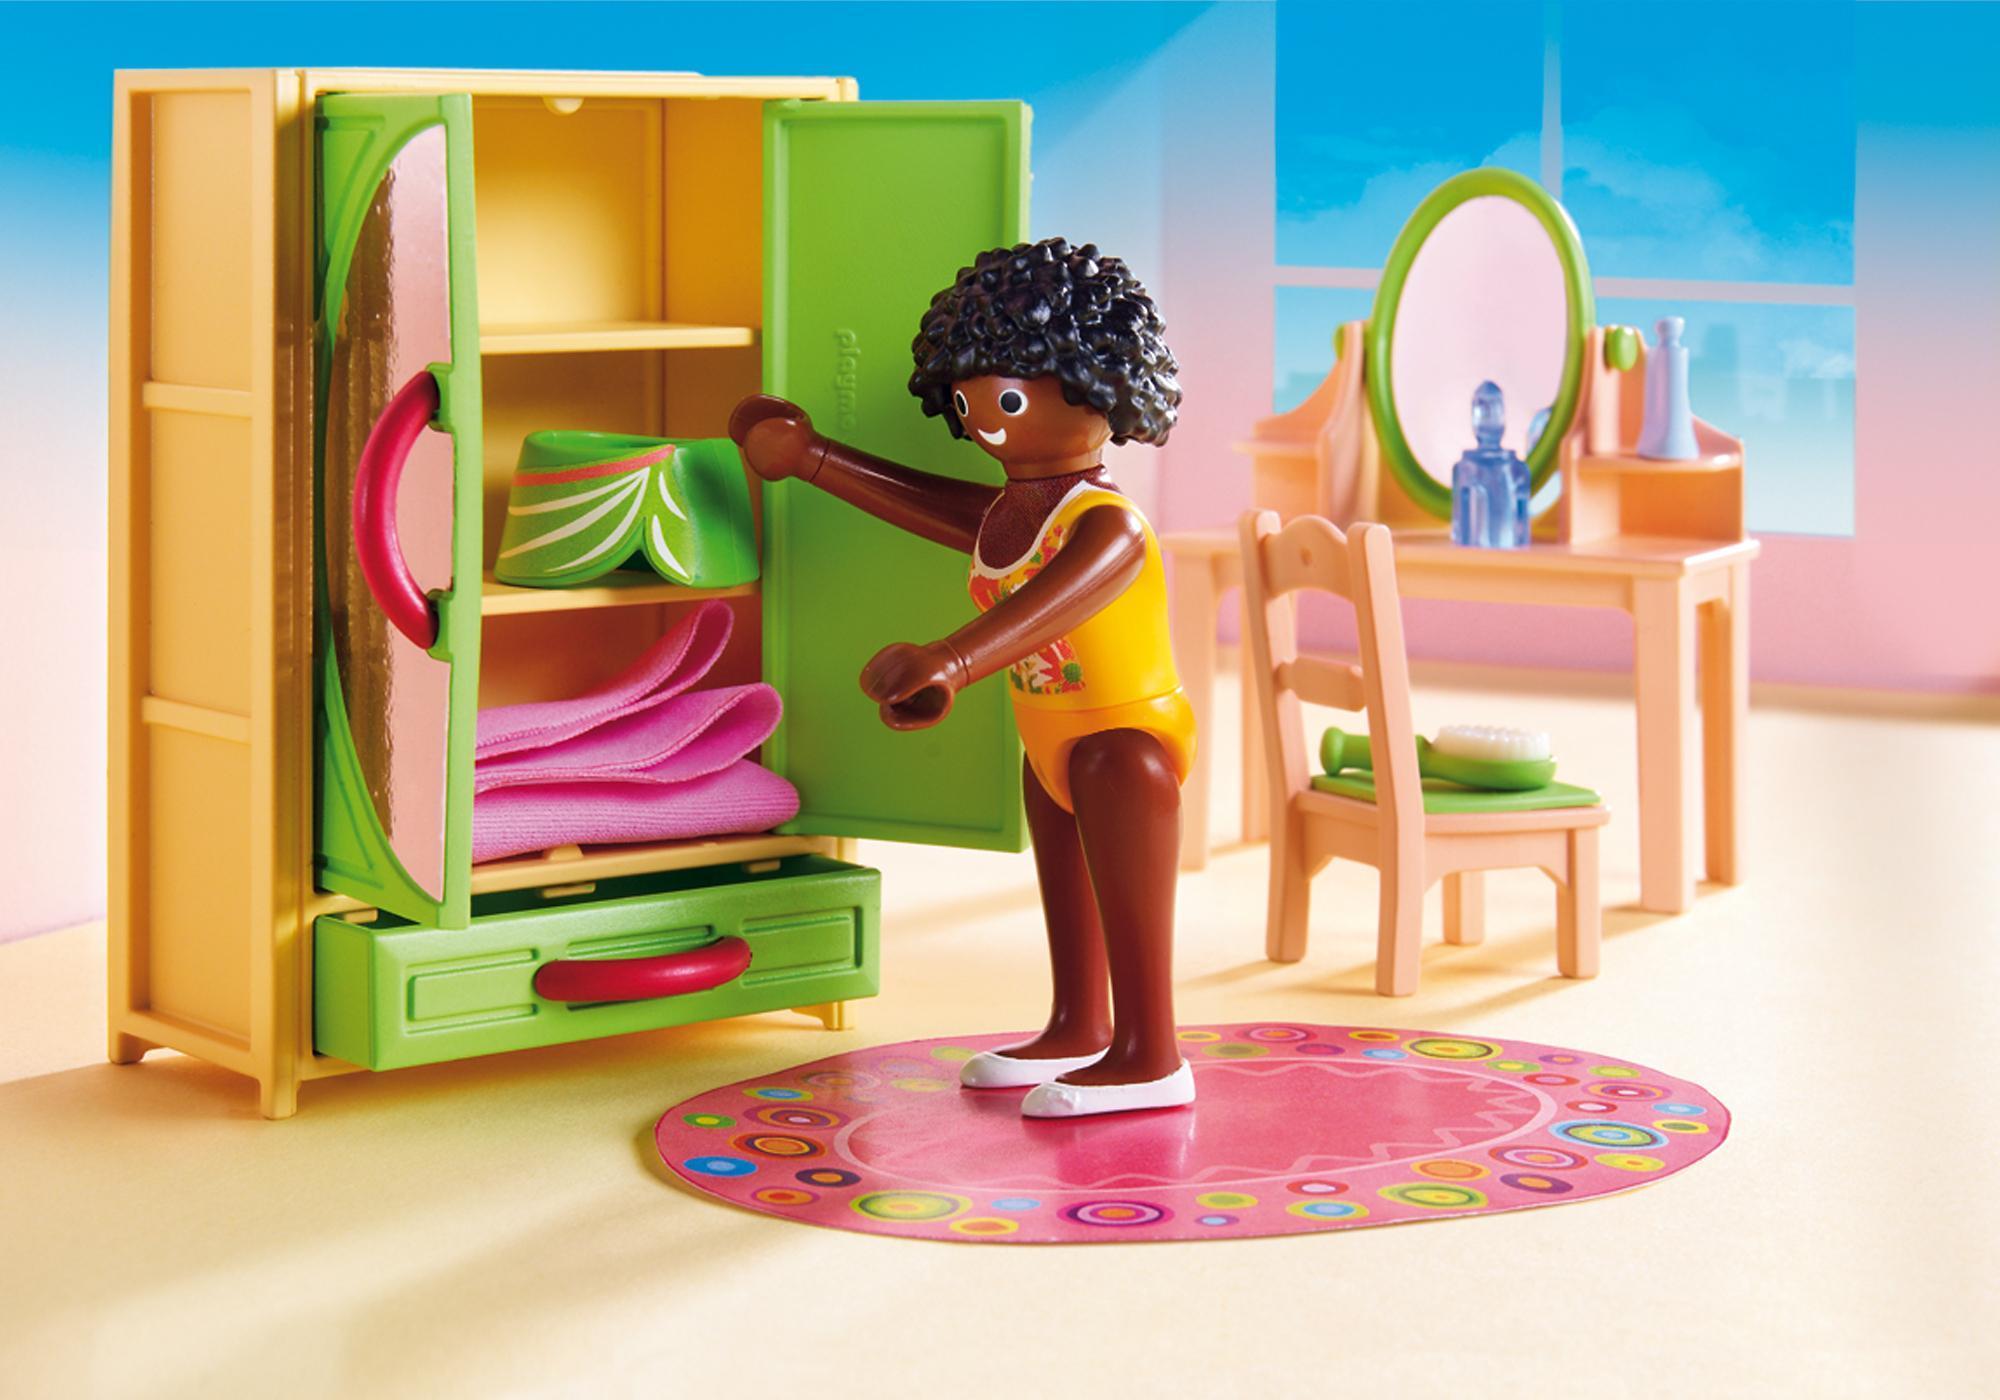 http://media.playmobil.com/i/playmobil/5309_product_extra1/Master Bedroom